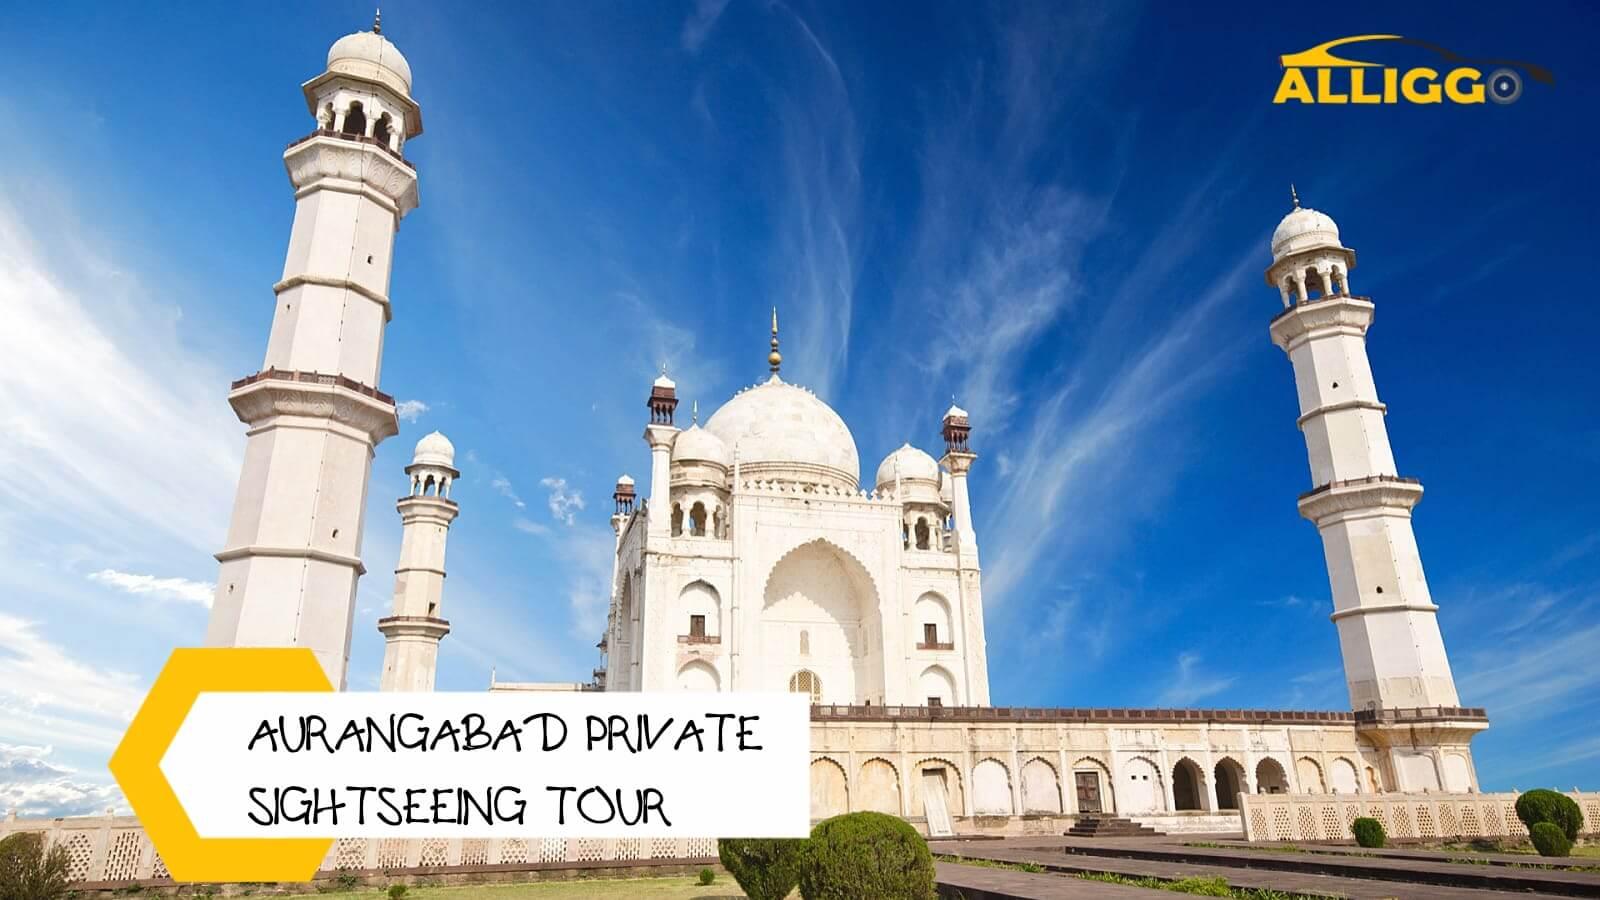 Alliggo_Car_Rentals_Aurangabad_Private_Sightseeing_Tour